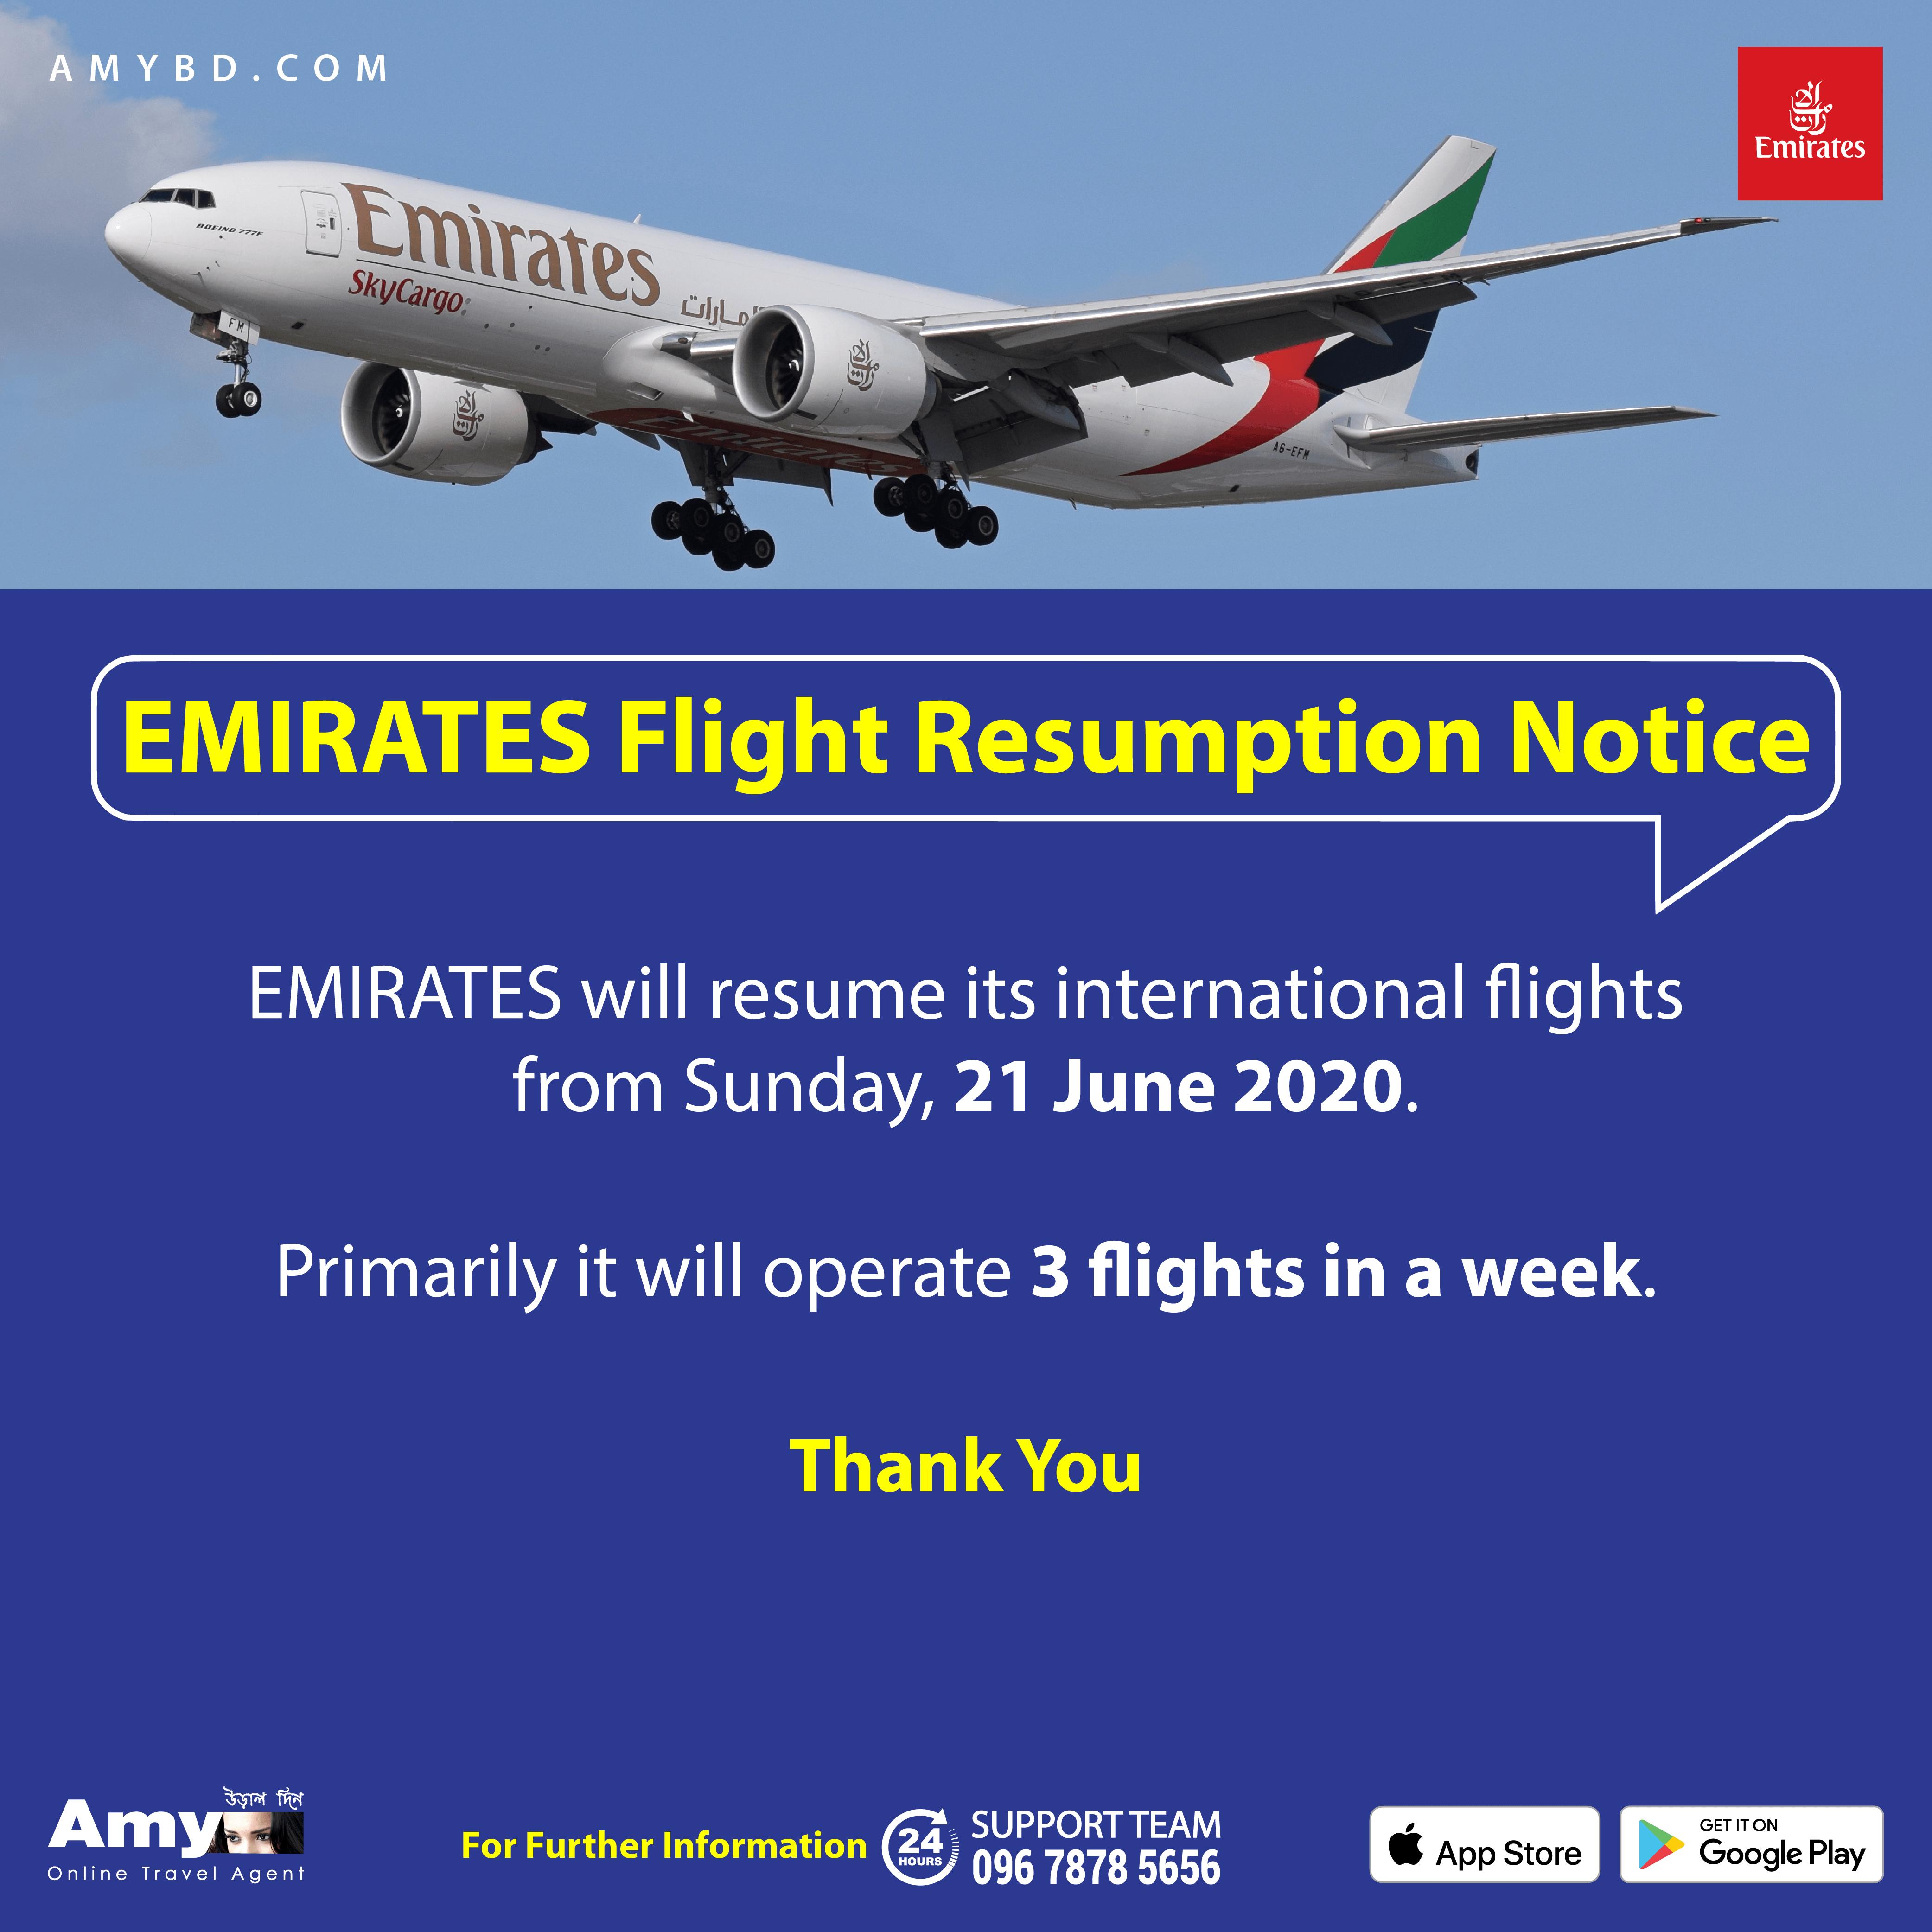 Emirates Resume Flights in 2020 Online travel agent